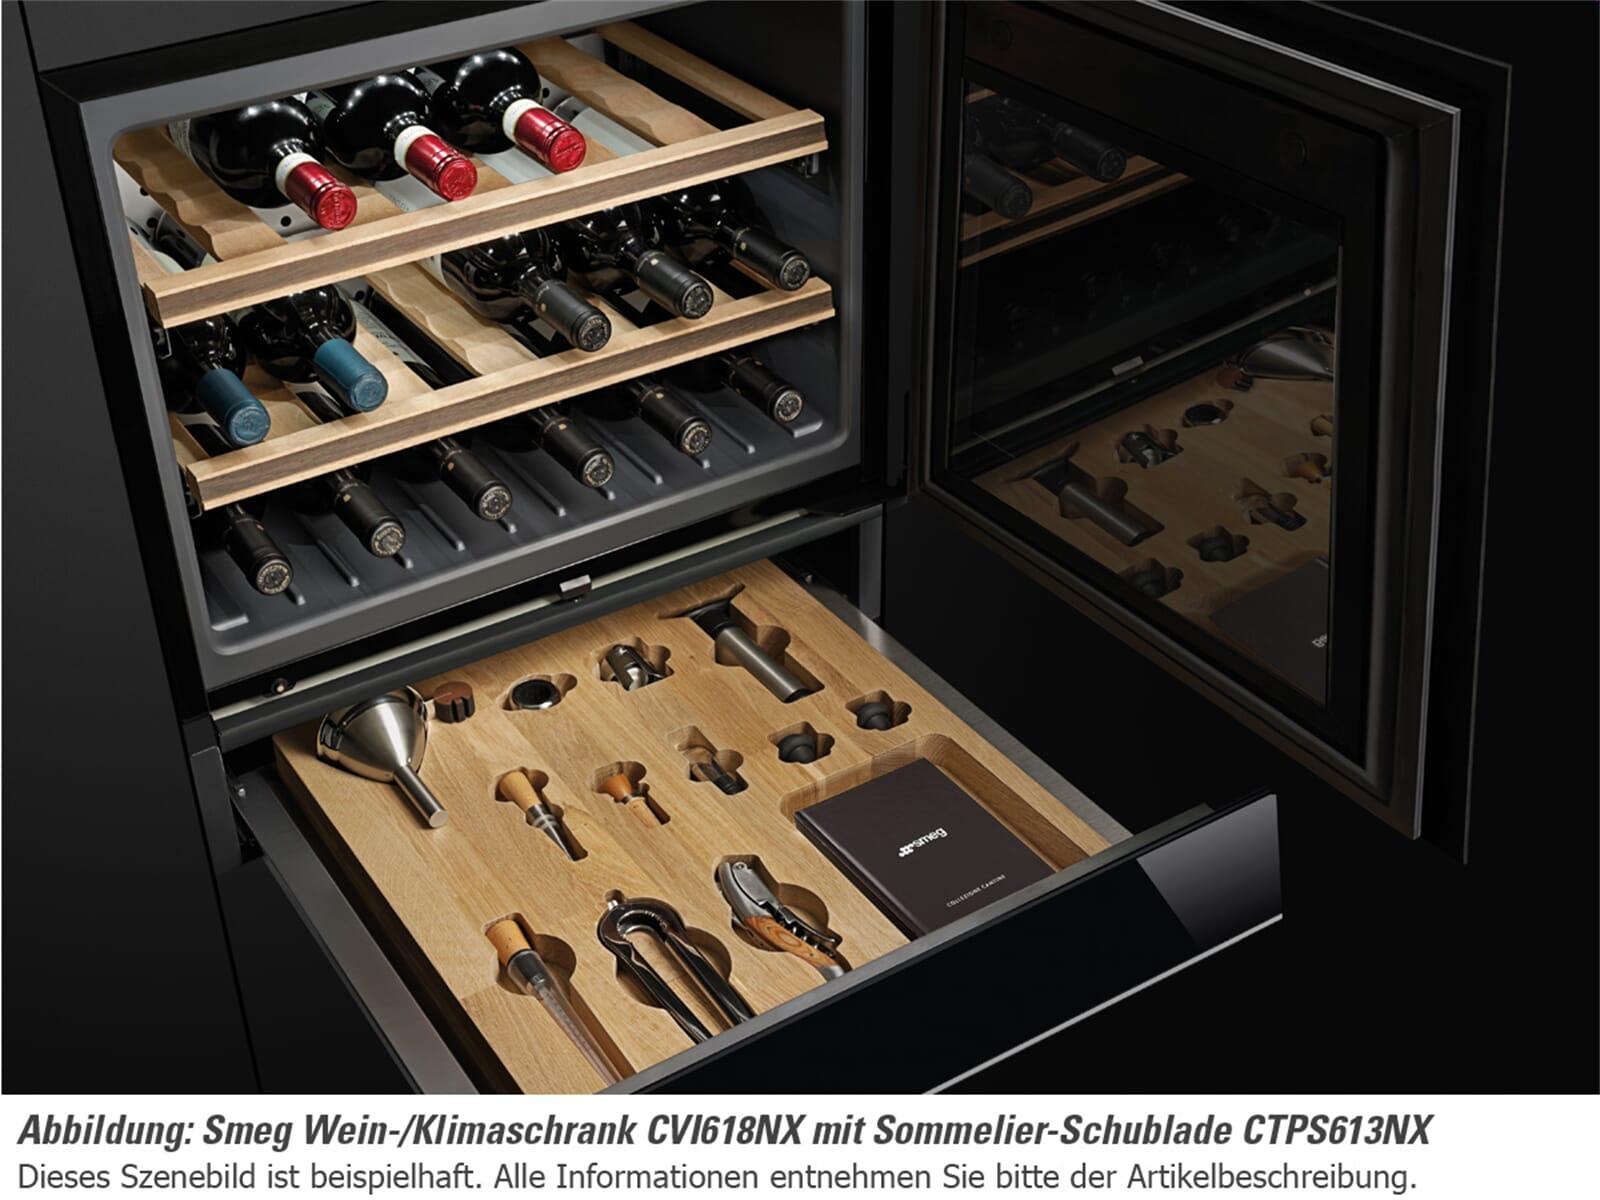 Smeg Cvi618nxs Einbau Weinkuhlschrank Weinklimaschrank Schwarzglas